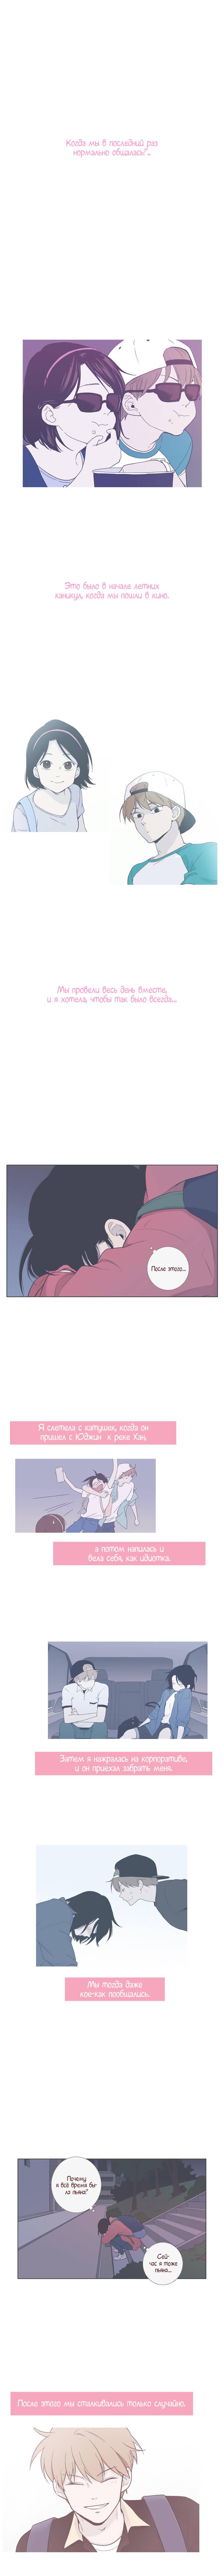 https://r1.ninemanga.com/comics/pic2/12/22860/419698/1534422329162.jpg Page 2